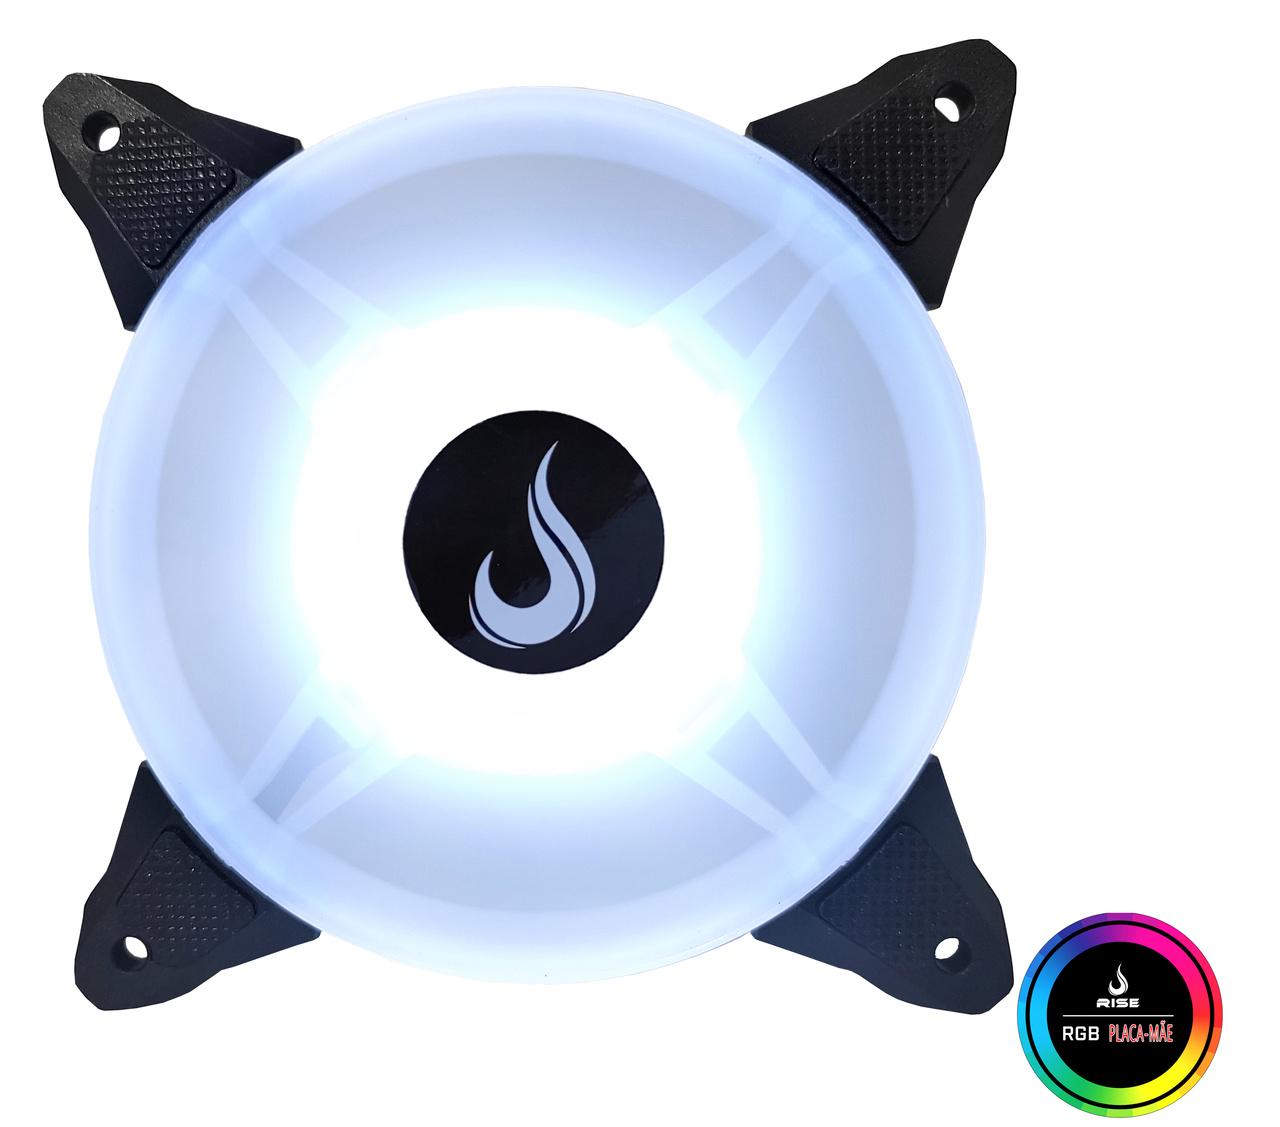 Fan Gamer Rise Mode Aqua Motherboard RGB 5V 120mm  - Loja Rise Mode